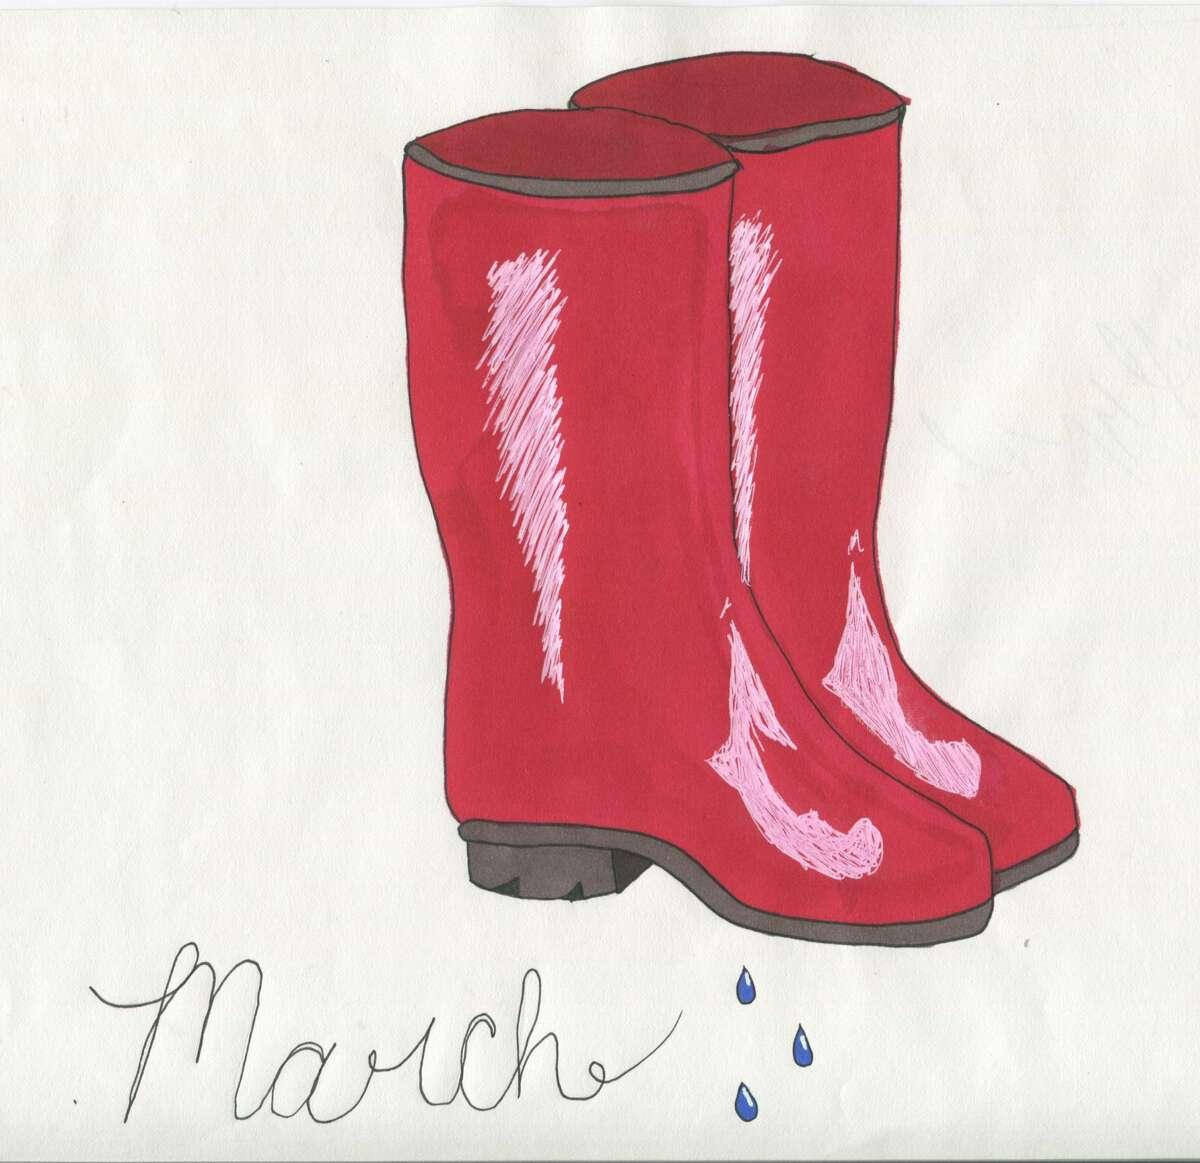 Caitlyn Maurer, 10th grade, Ubly High School